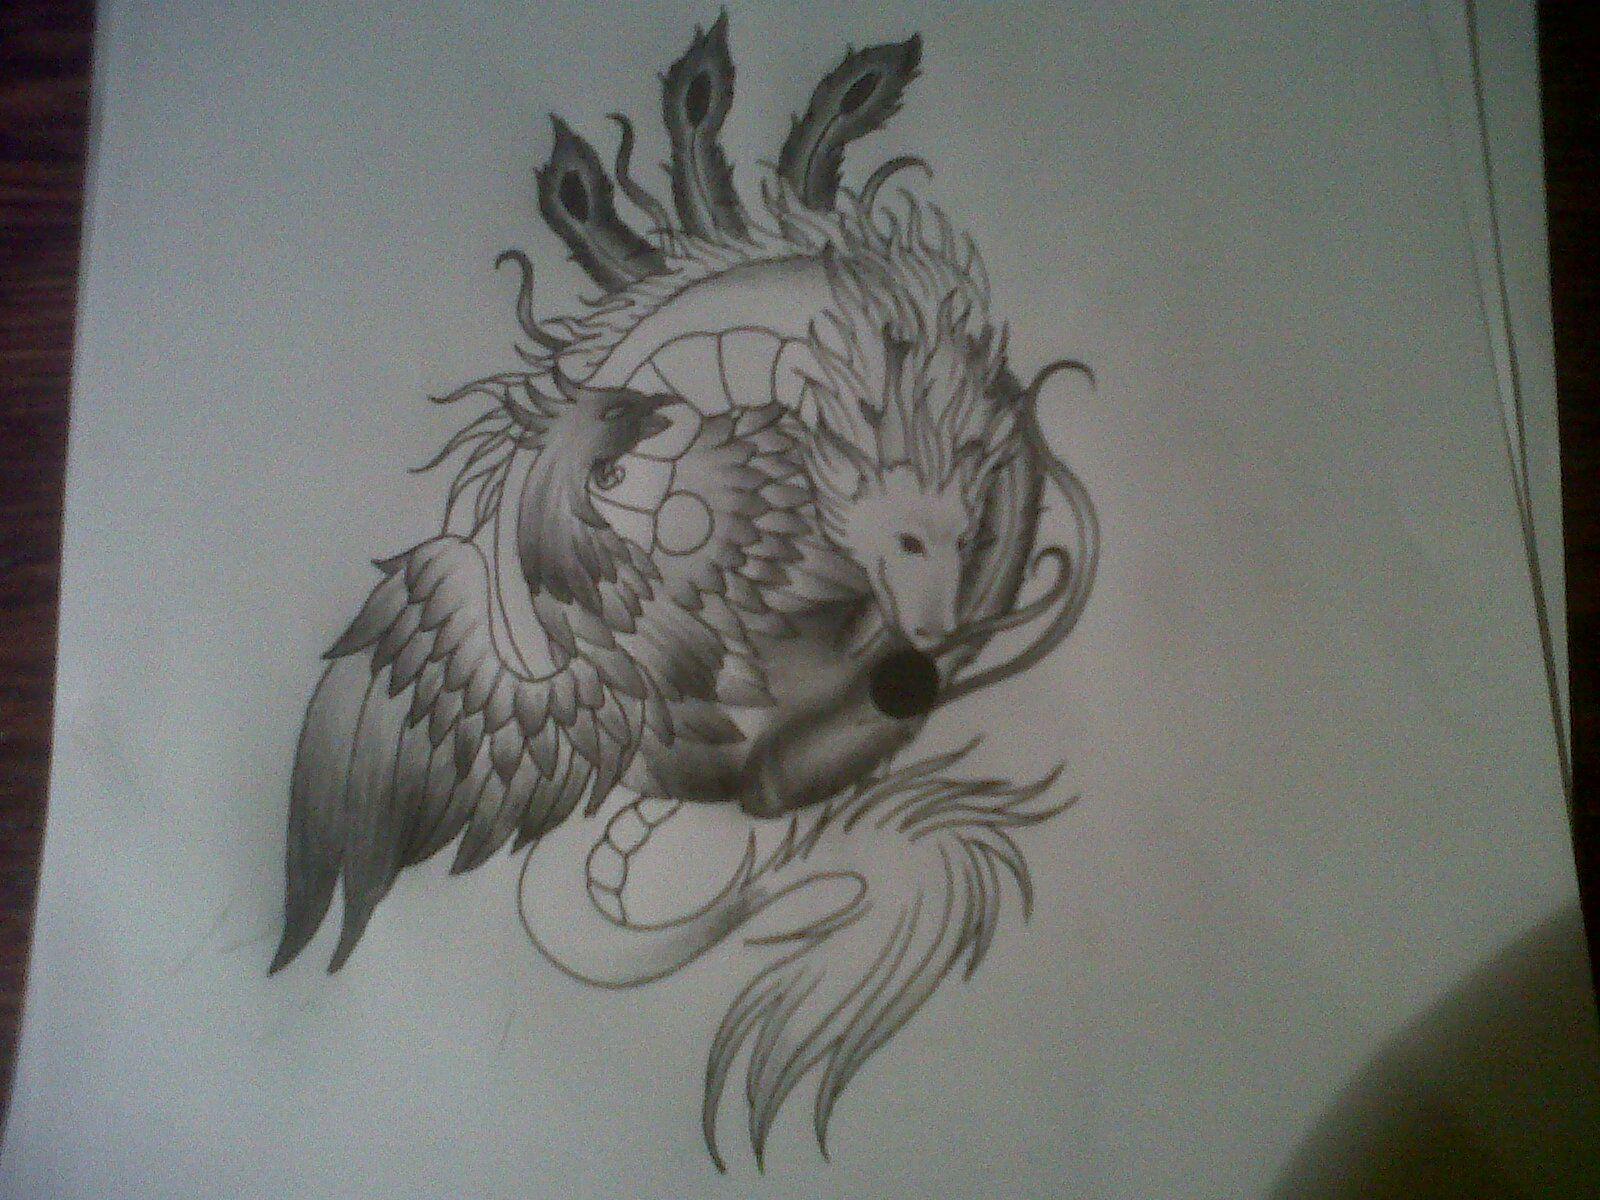 e8eb06e61 phoenix dragon ying yang tattoo design by tattoosuzette on deviantART